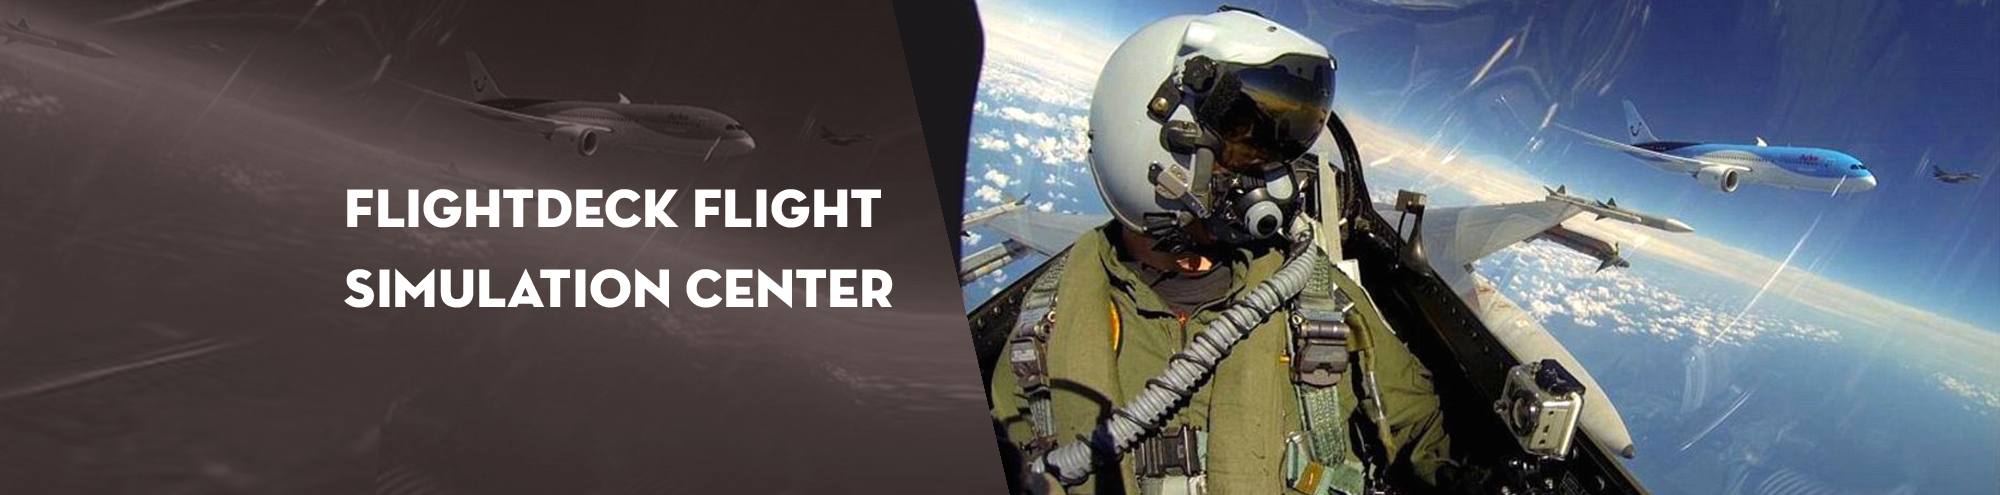 Flightdeck Flight Simulation Center Orange County